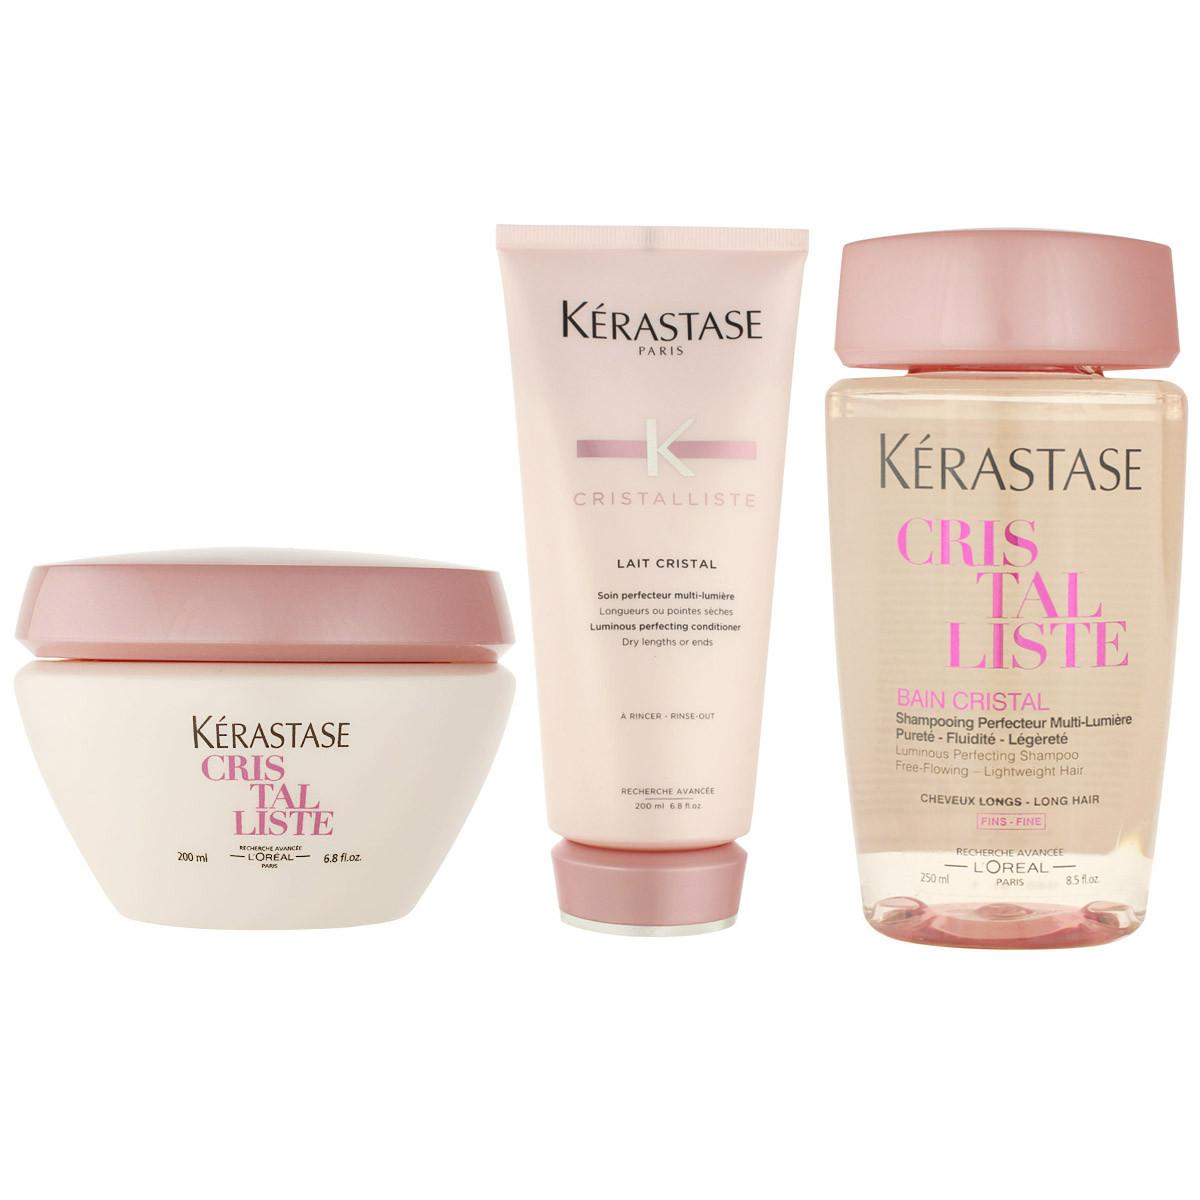 K rastase cristalliste bain cristal luminous perf shampoo for Kerastase bain miroir conditioner